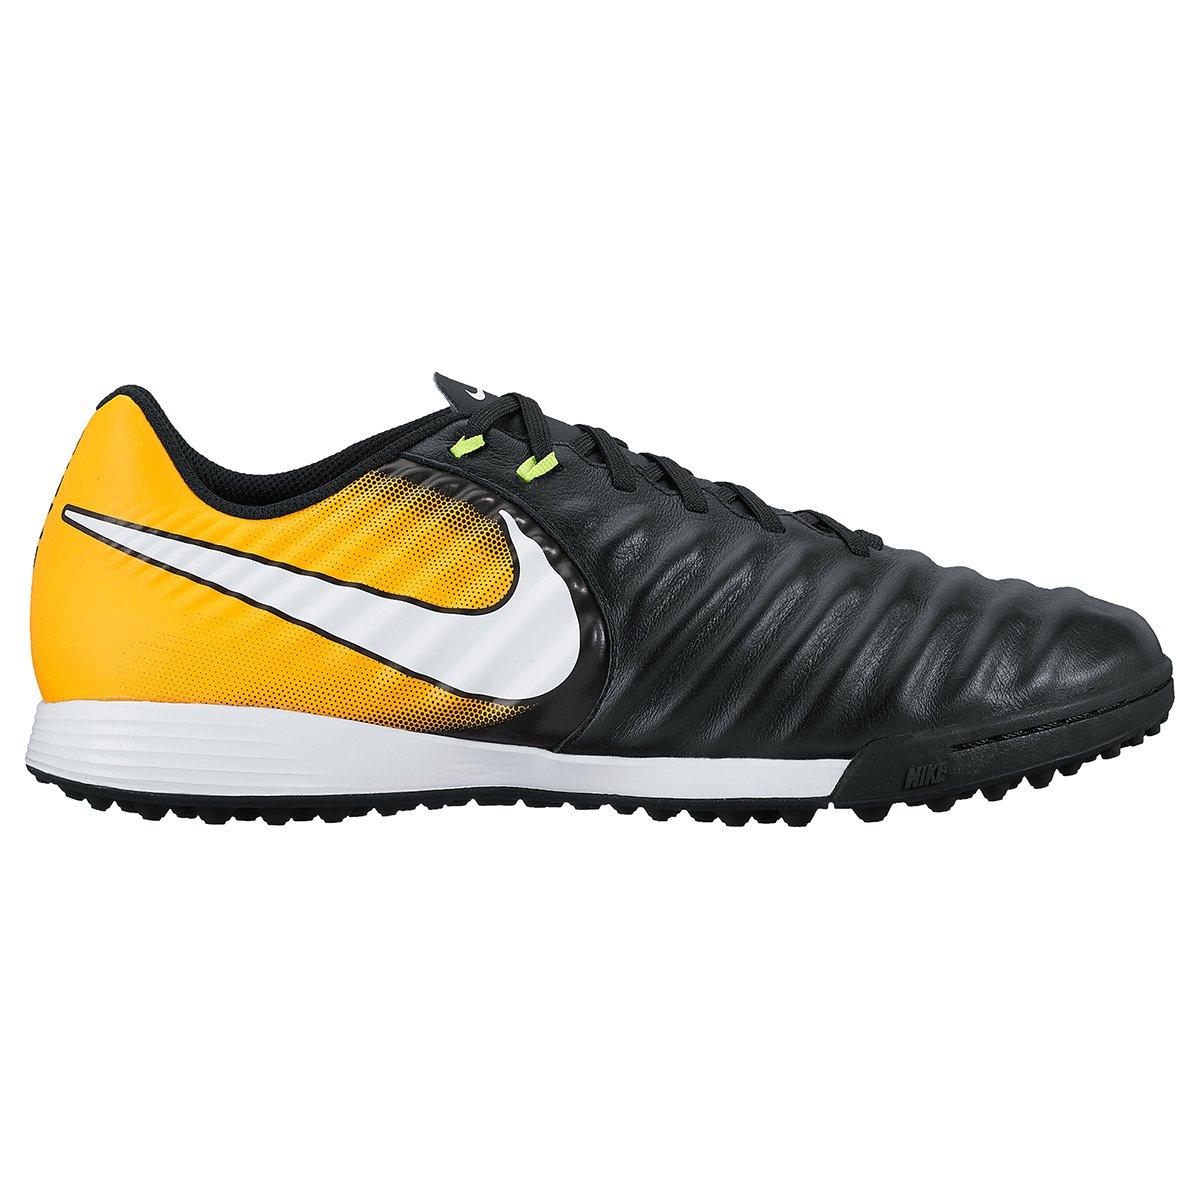 dece6faa4b Chuteira Society Nike Tiempo Ligera 4 TF - Preto e Laranja